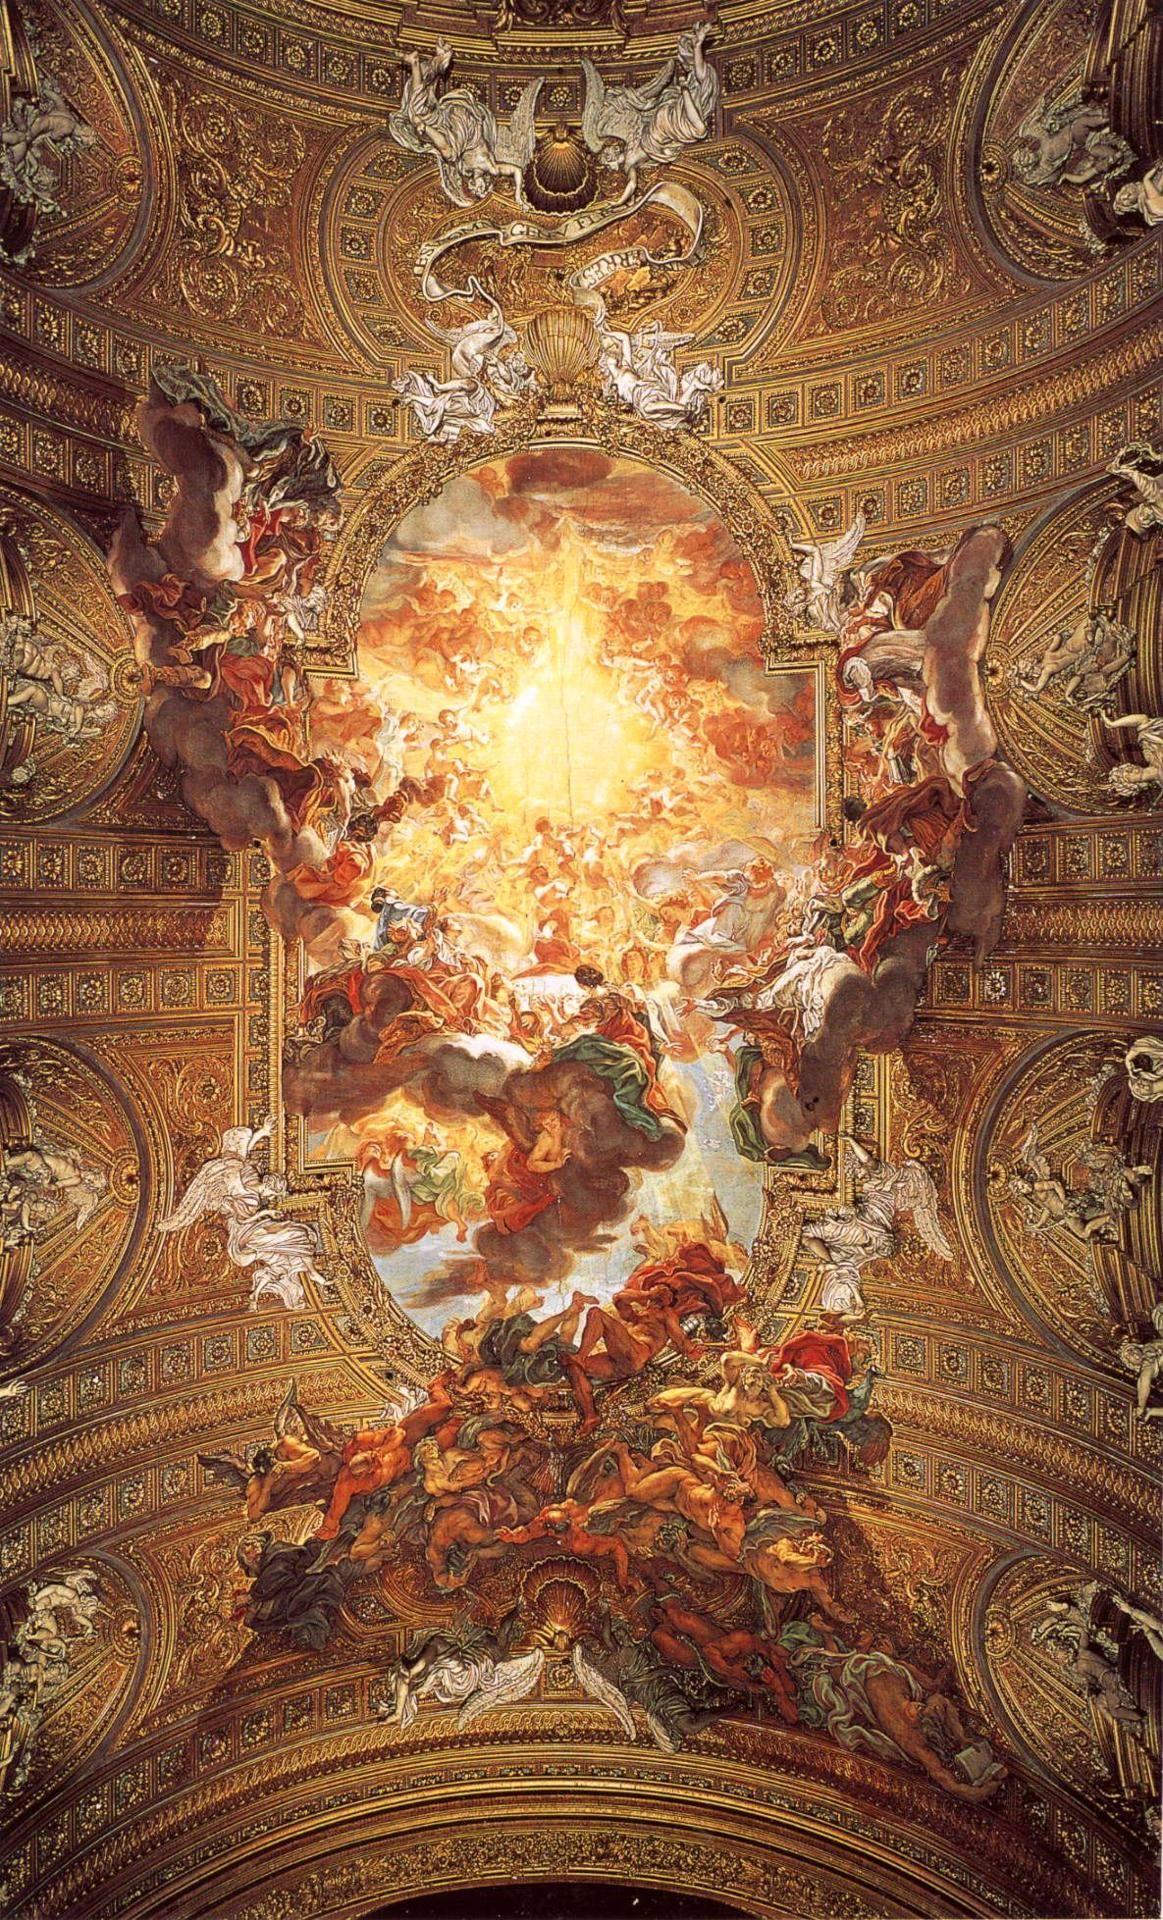 Baciccia Giovanni Batista Gaulli Triumph Of The Name Of Jesus 1676 1679 Fresco Ceiling Fresco In Il Gesu Rennaissance Art Classical Art Baroque Art